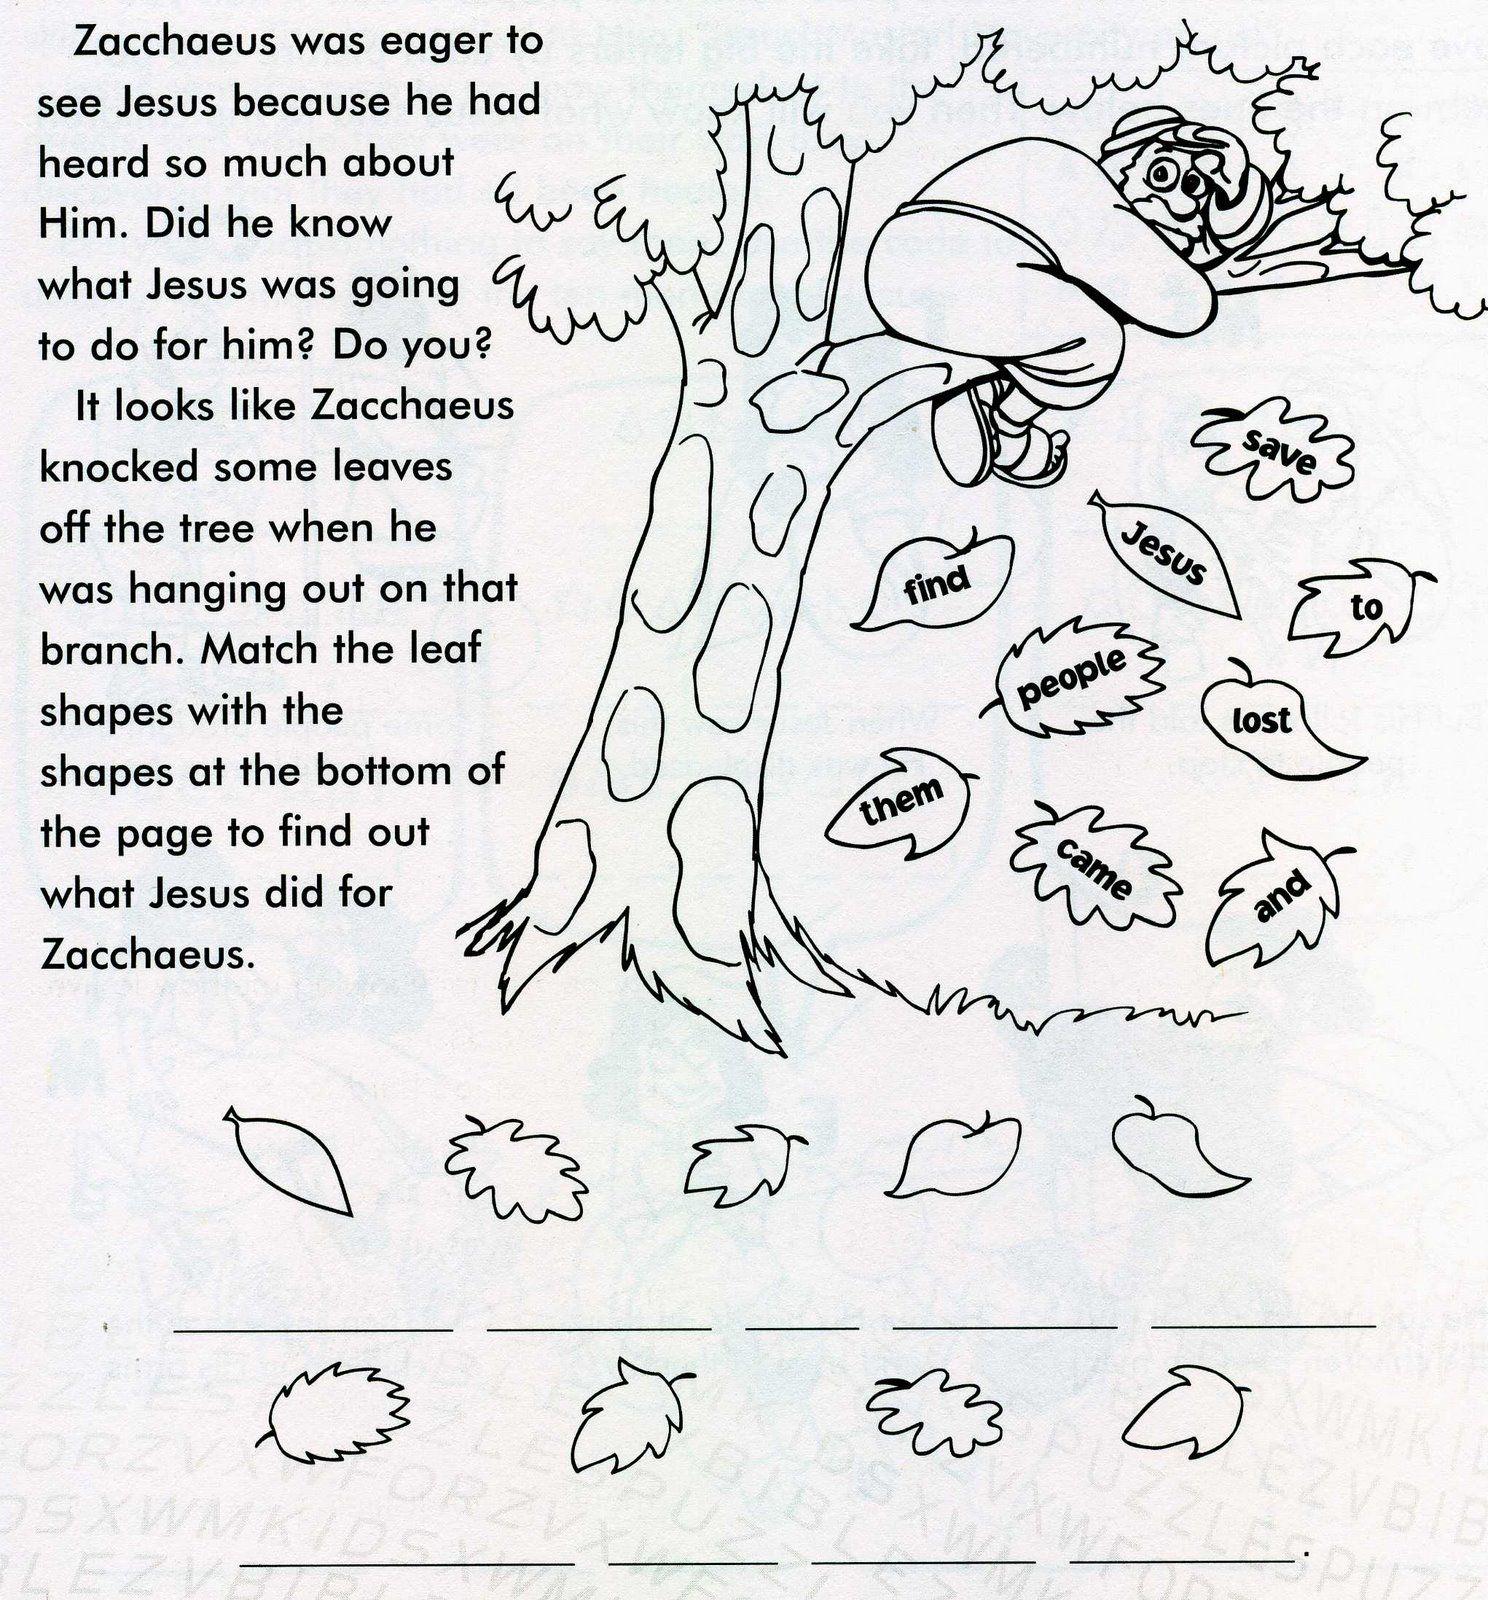 Zacchaeus Image In